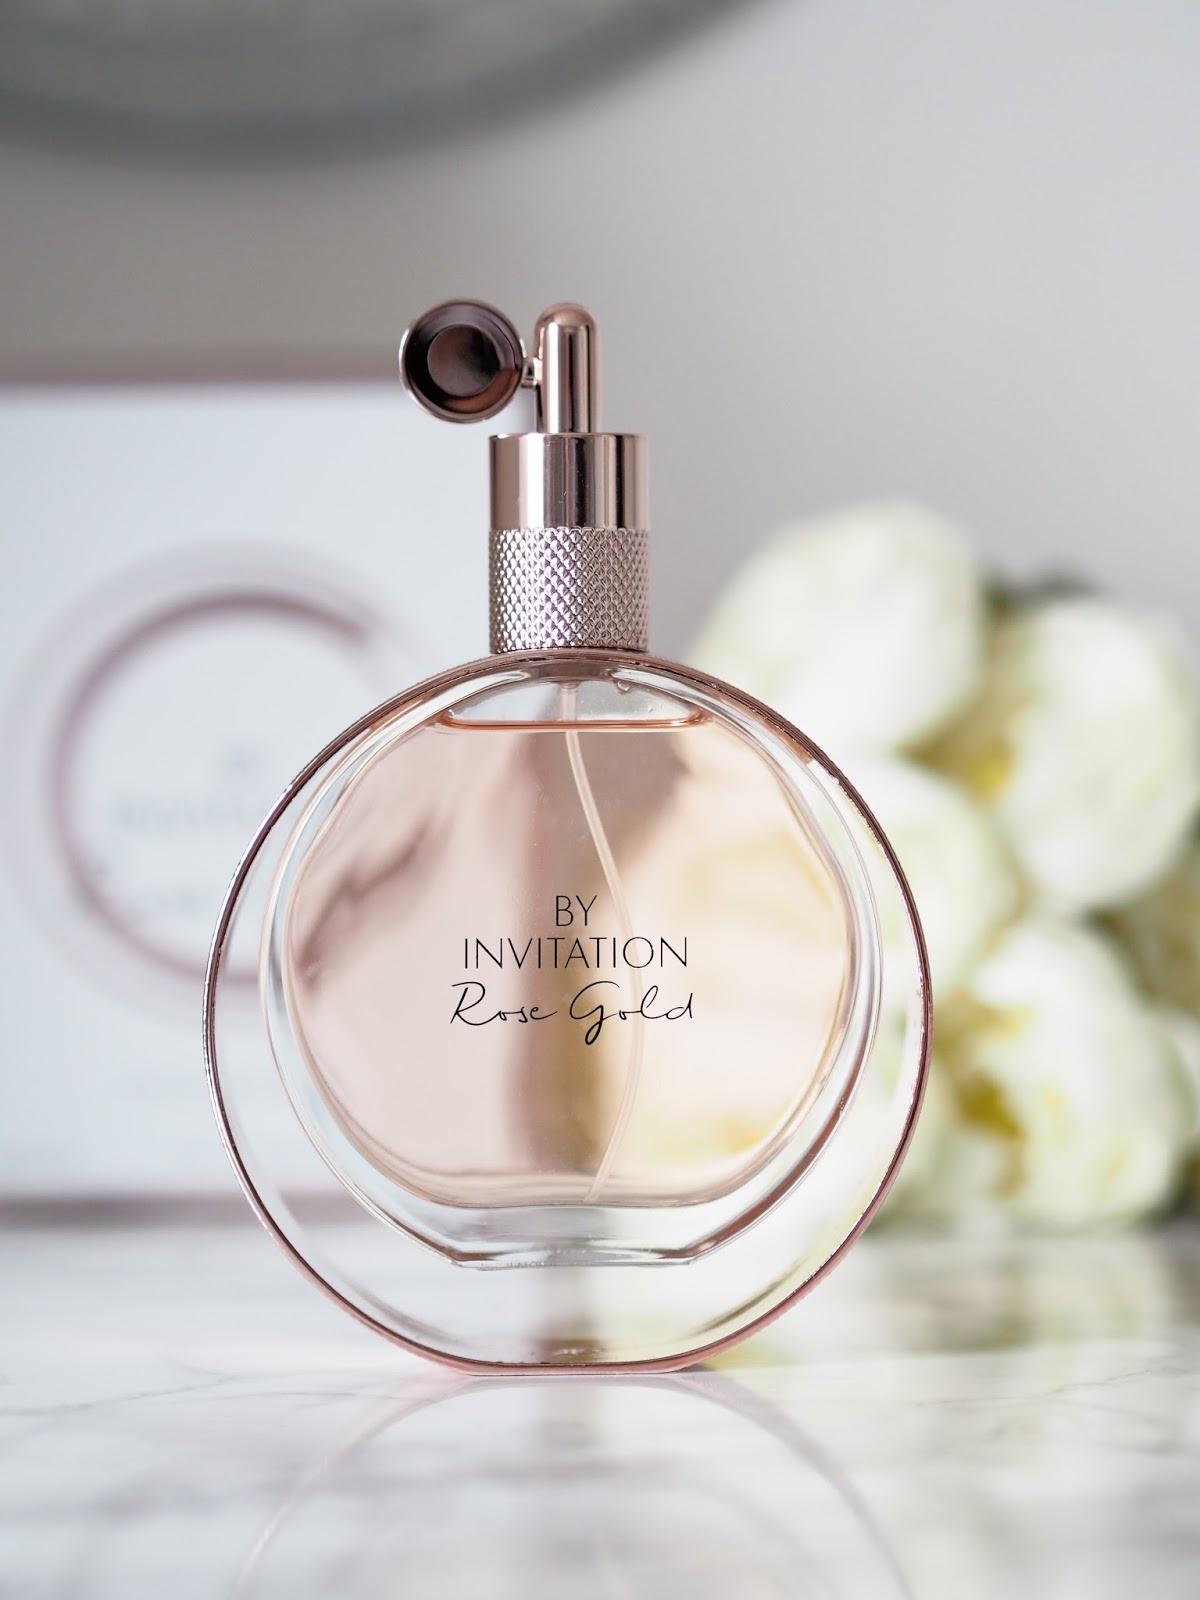 Michael bublé By Invitation Rose Gold eau de parfum Floral oriental gourmand fragrance \ Priceless lLife of Mine \ over 40 lifestyle blog